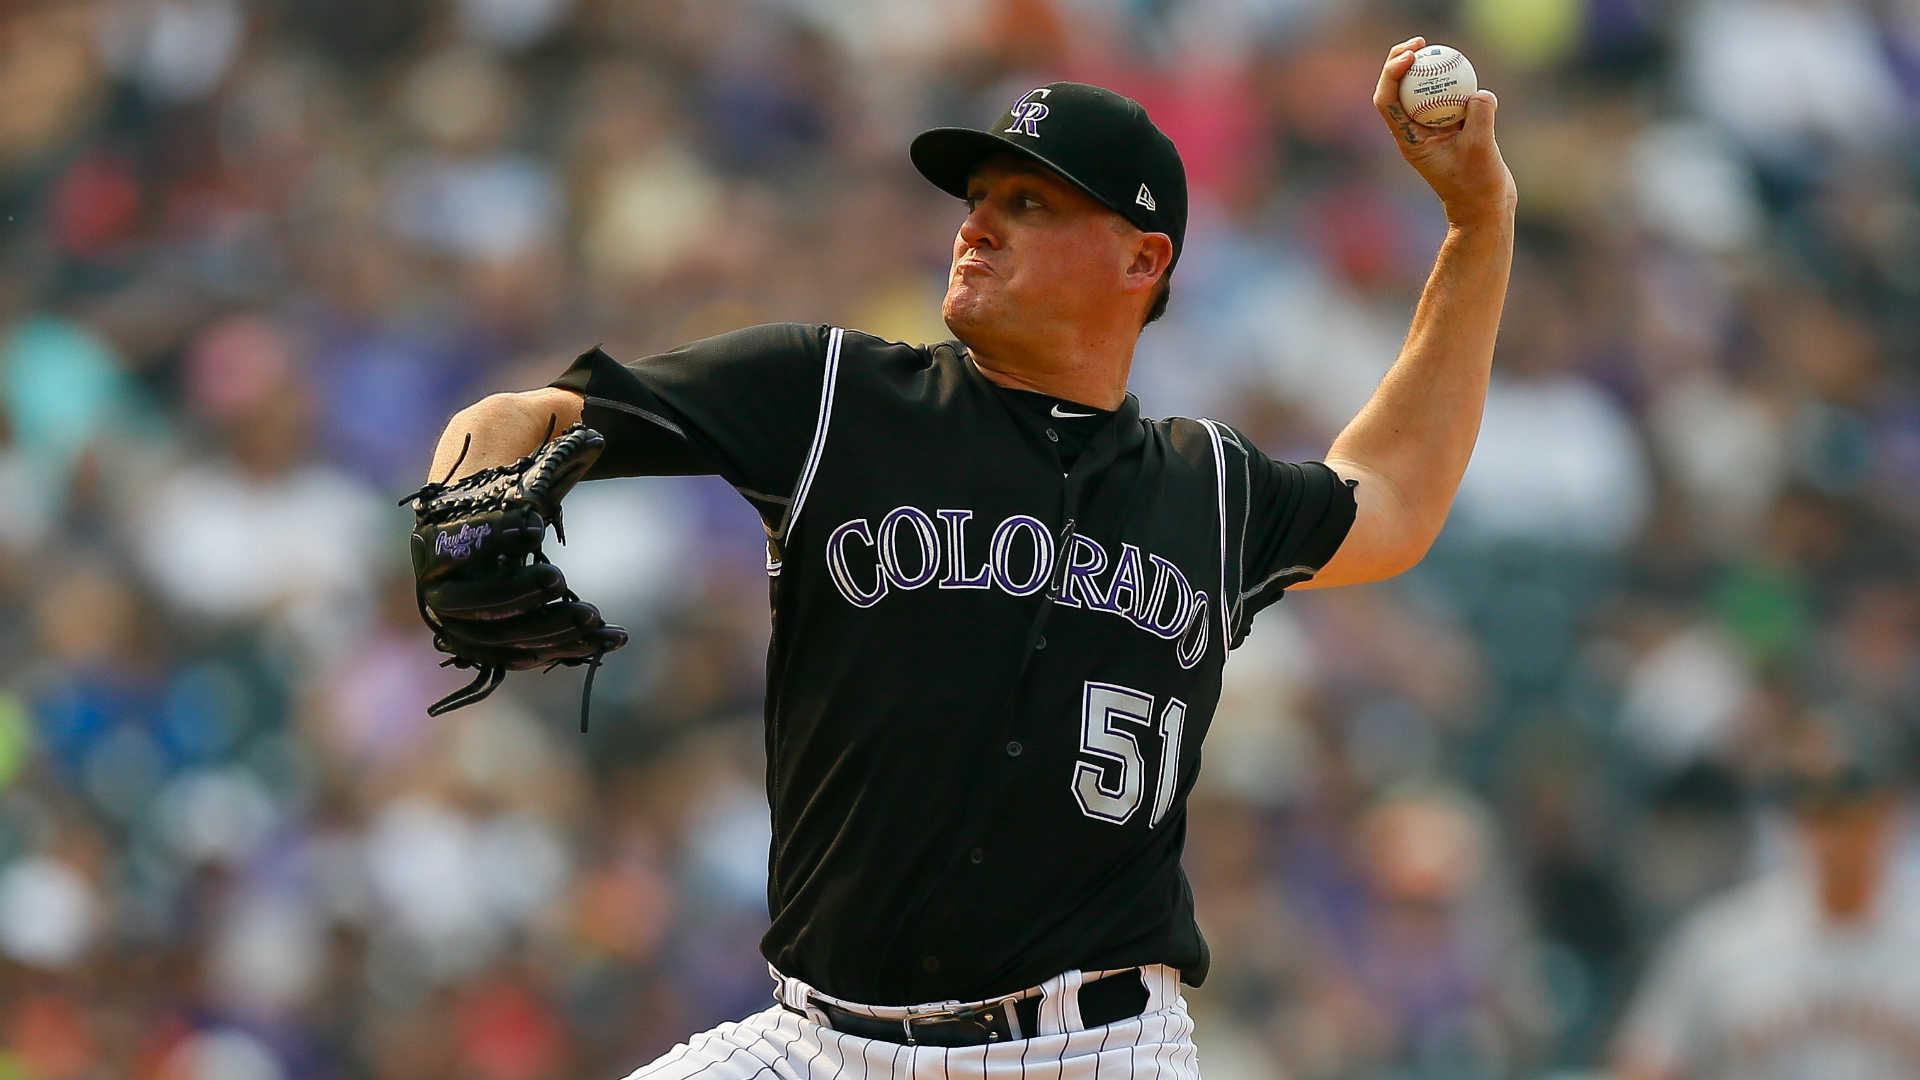 MLB free agent rumors: Rockies bolster bullpen, close in on Greg Holland deal